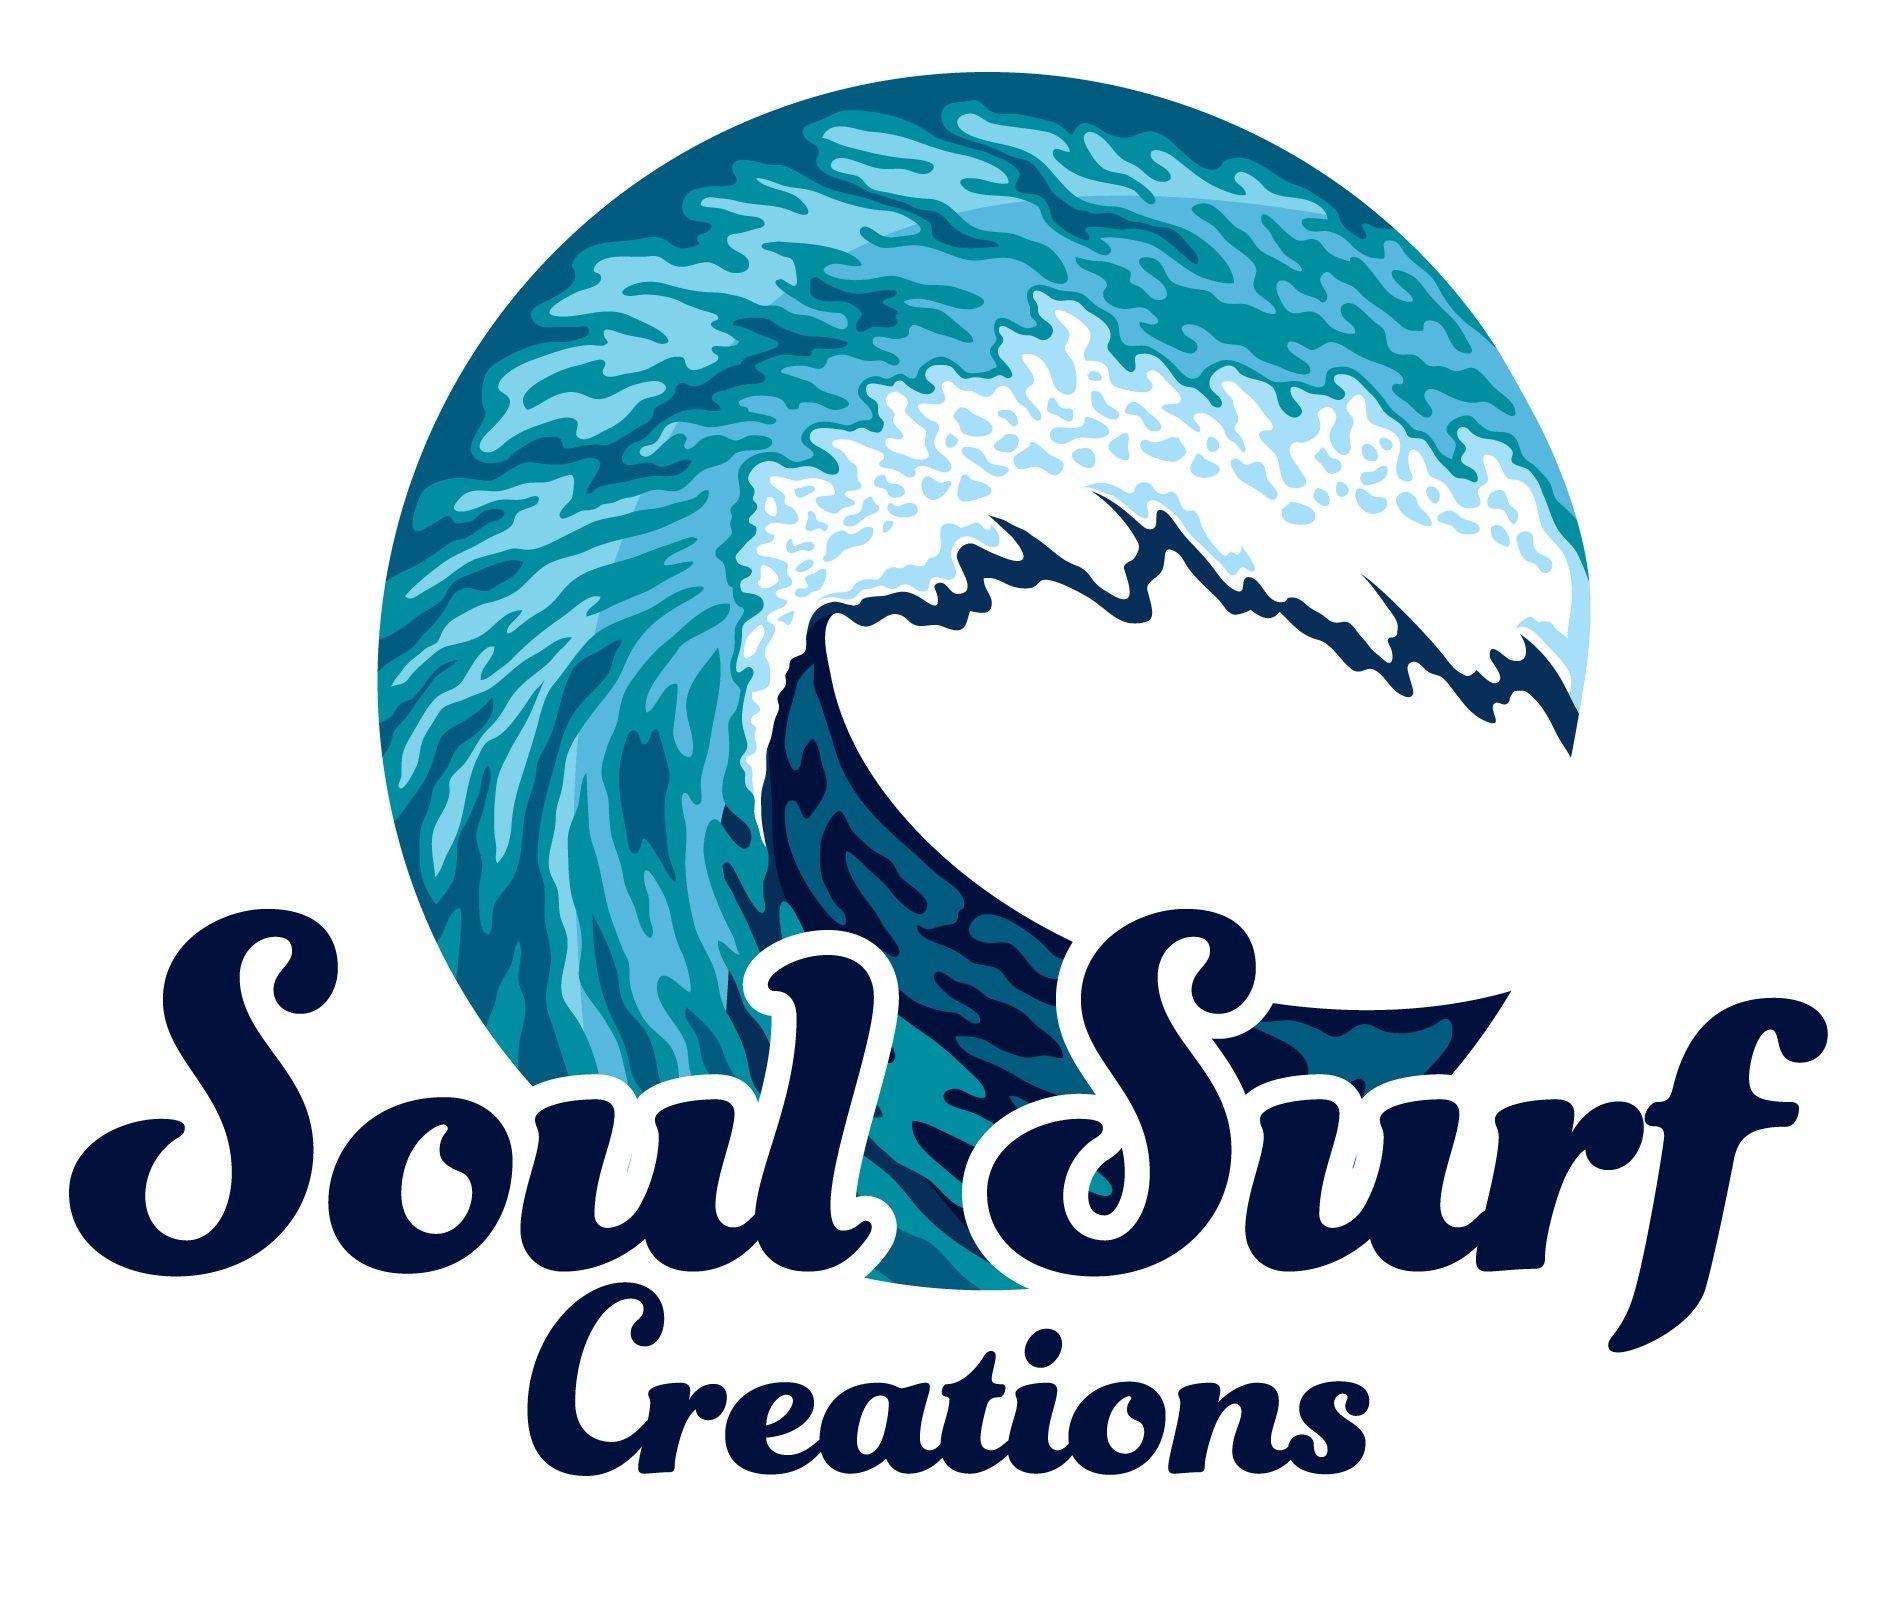 soul-surf-creations-jpeg.jpg